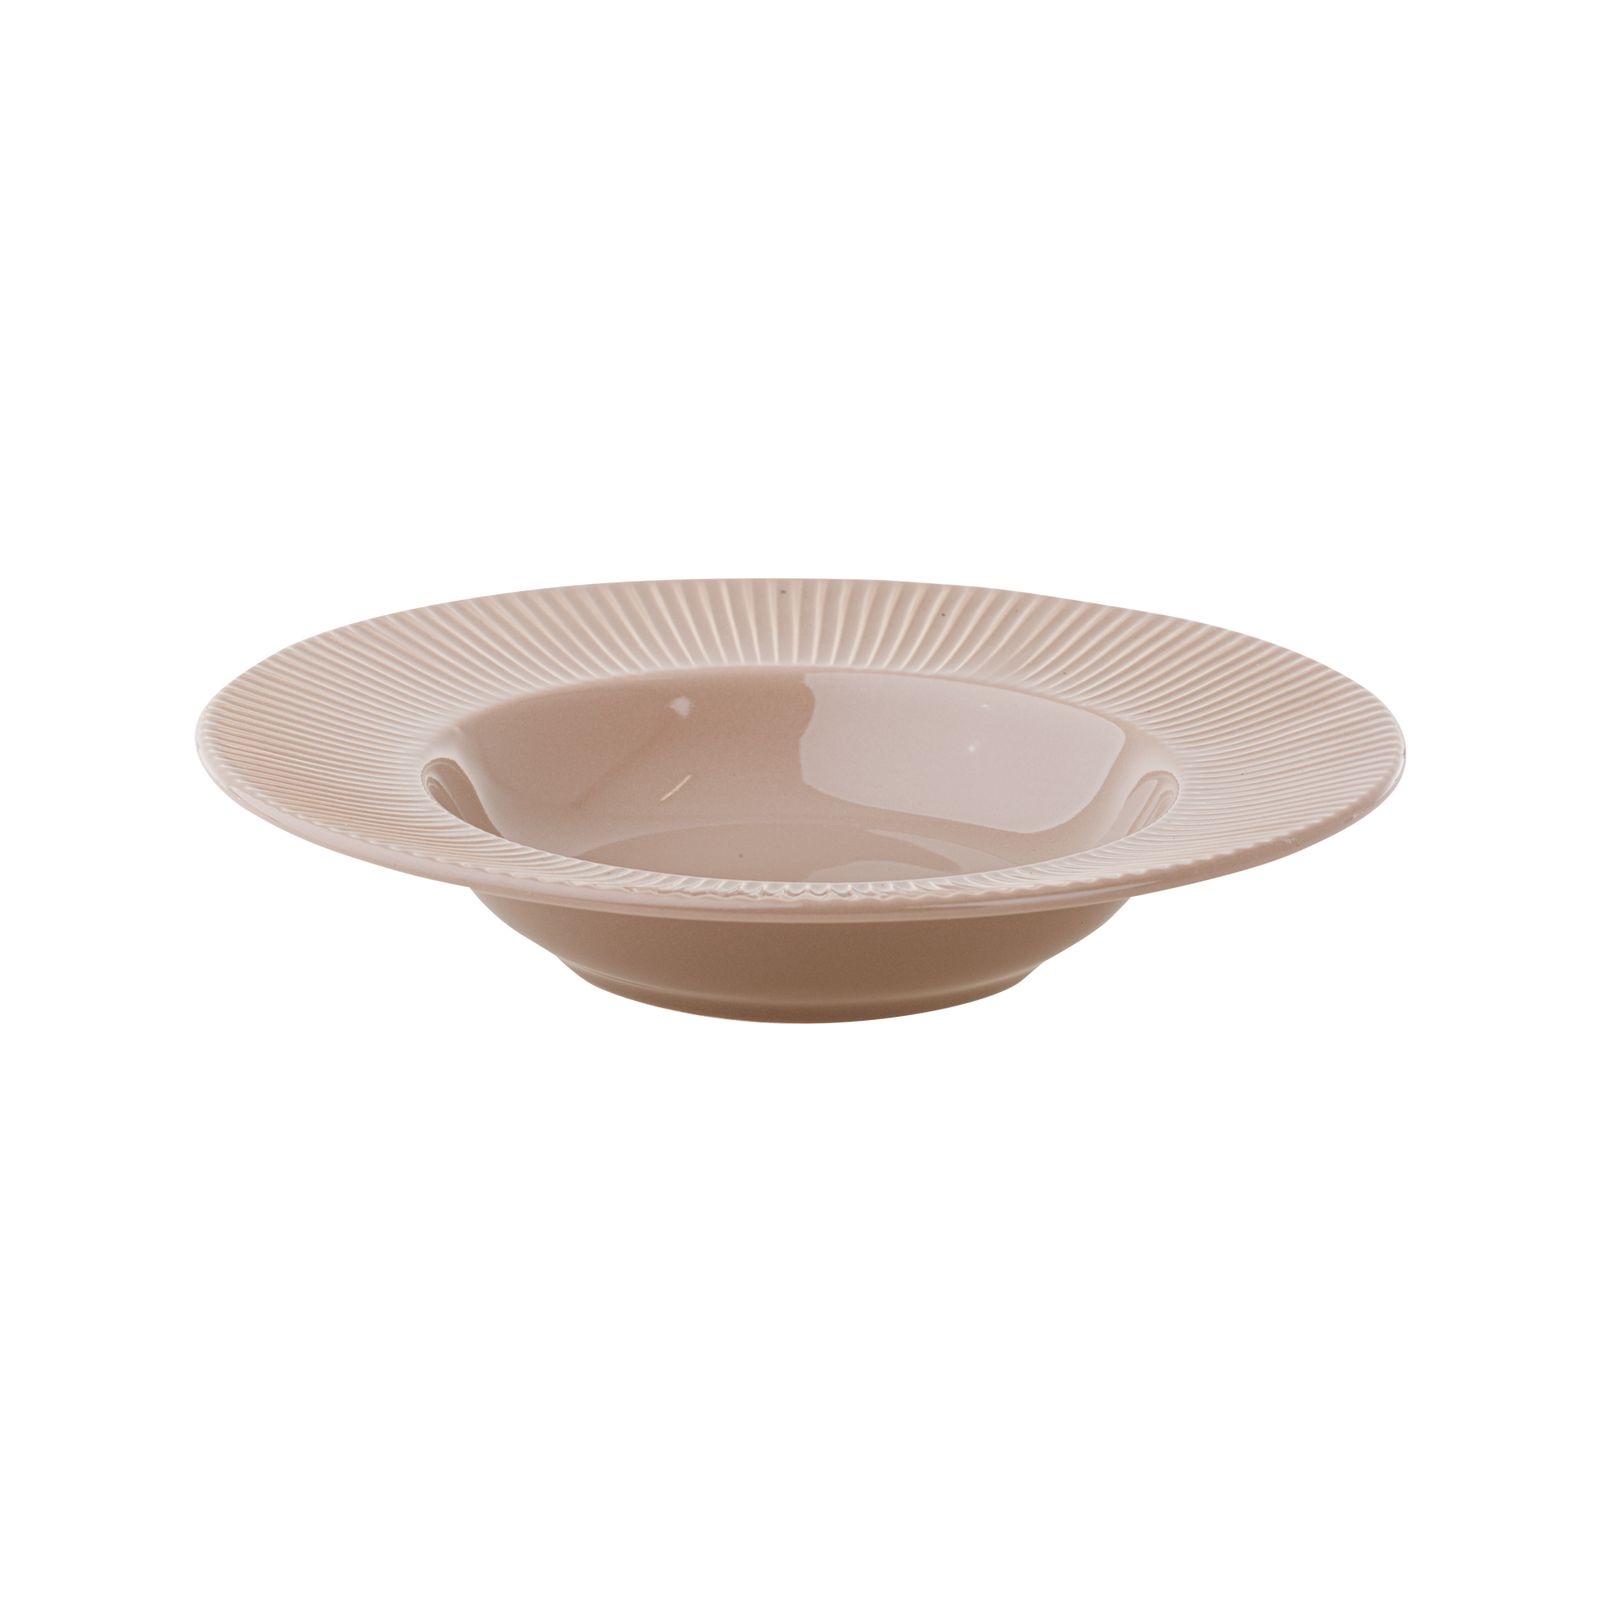 Soup plate Palette 24 cm AMBITION Sensual brown